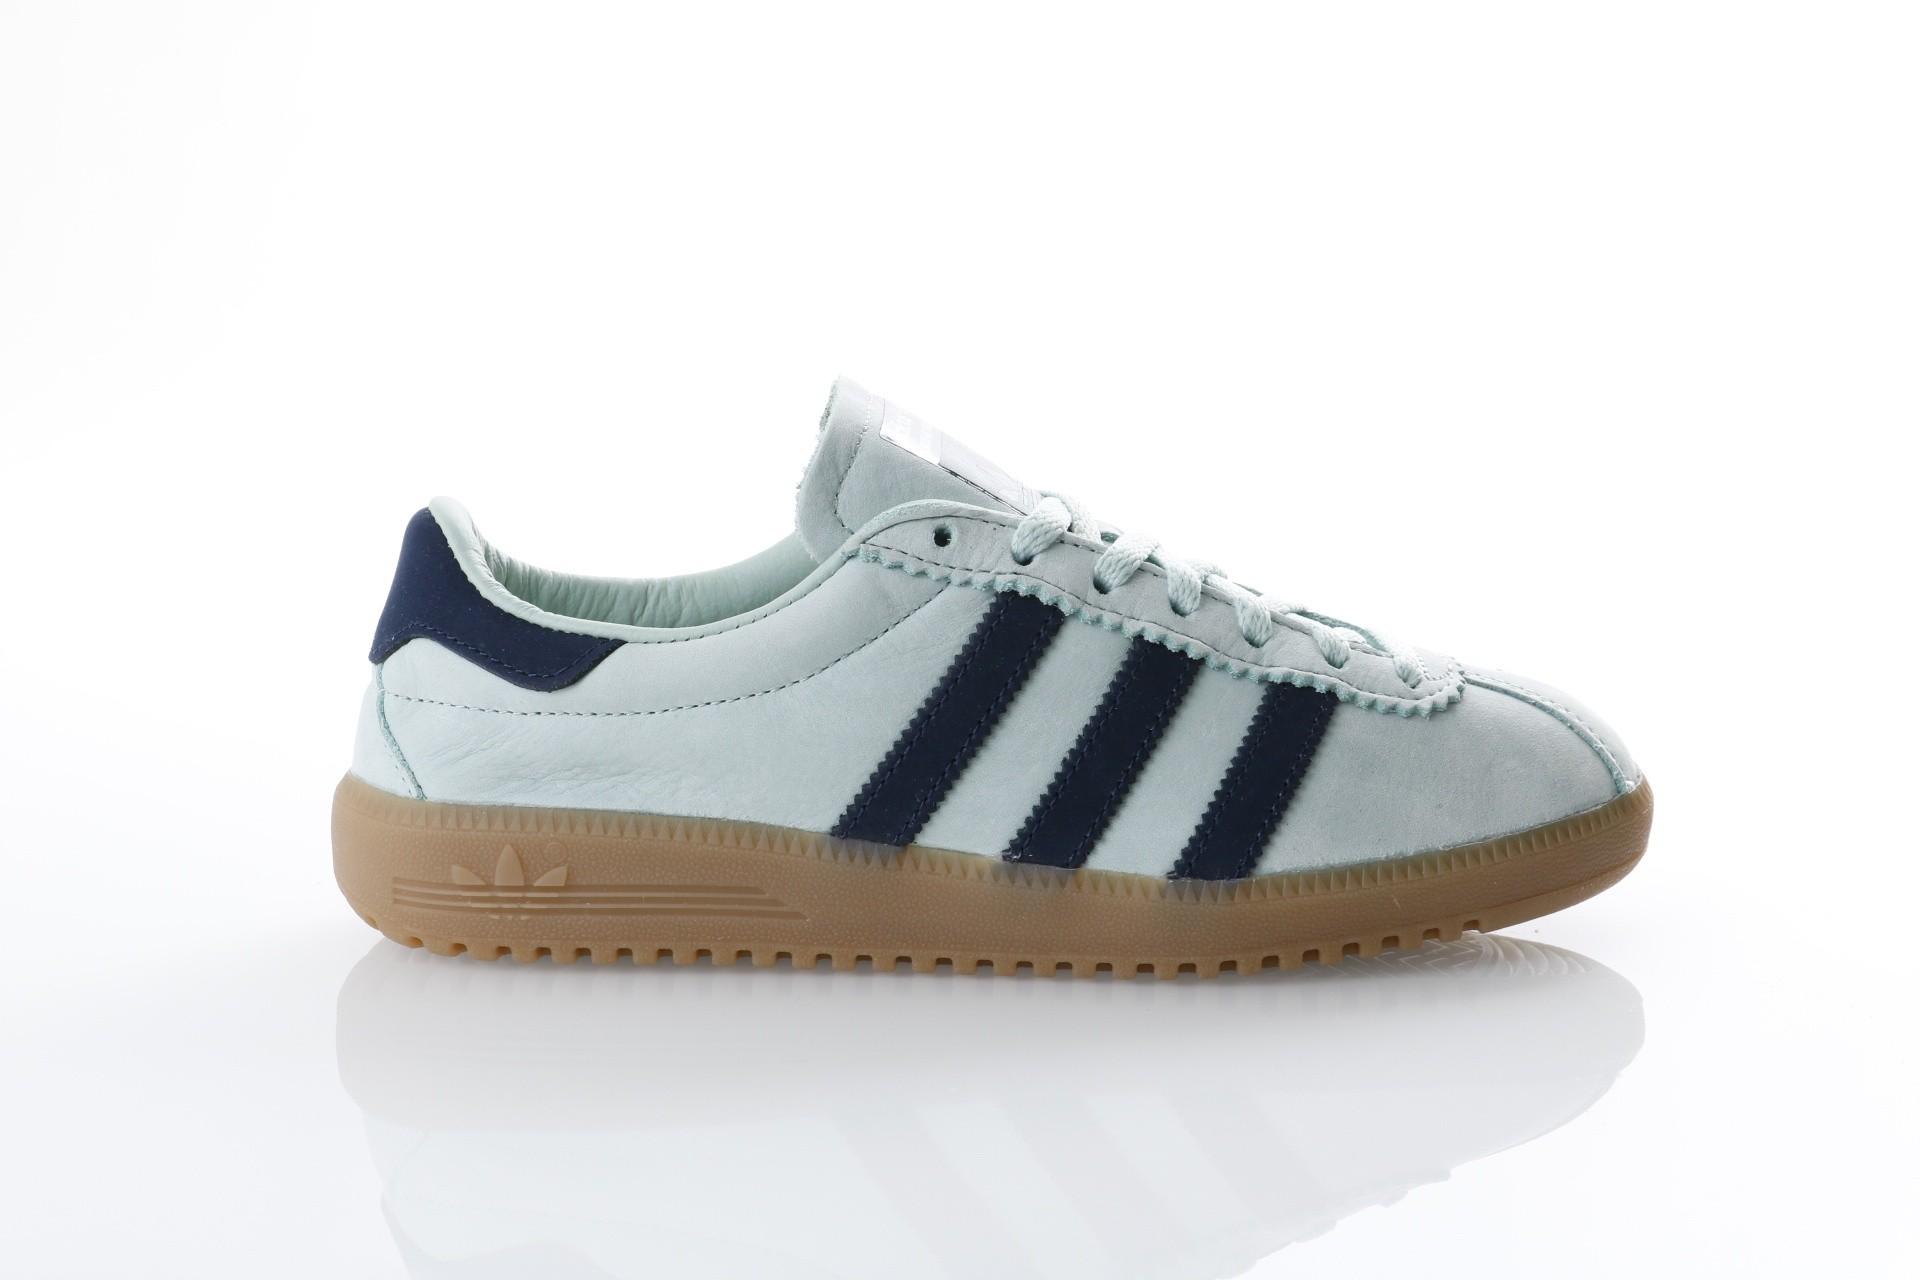 Foto van Adidas Originals CQ2783 Sneakers Bermuda Ash green/collegiate navy/gum